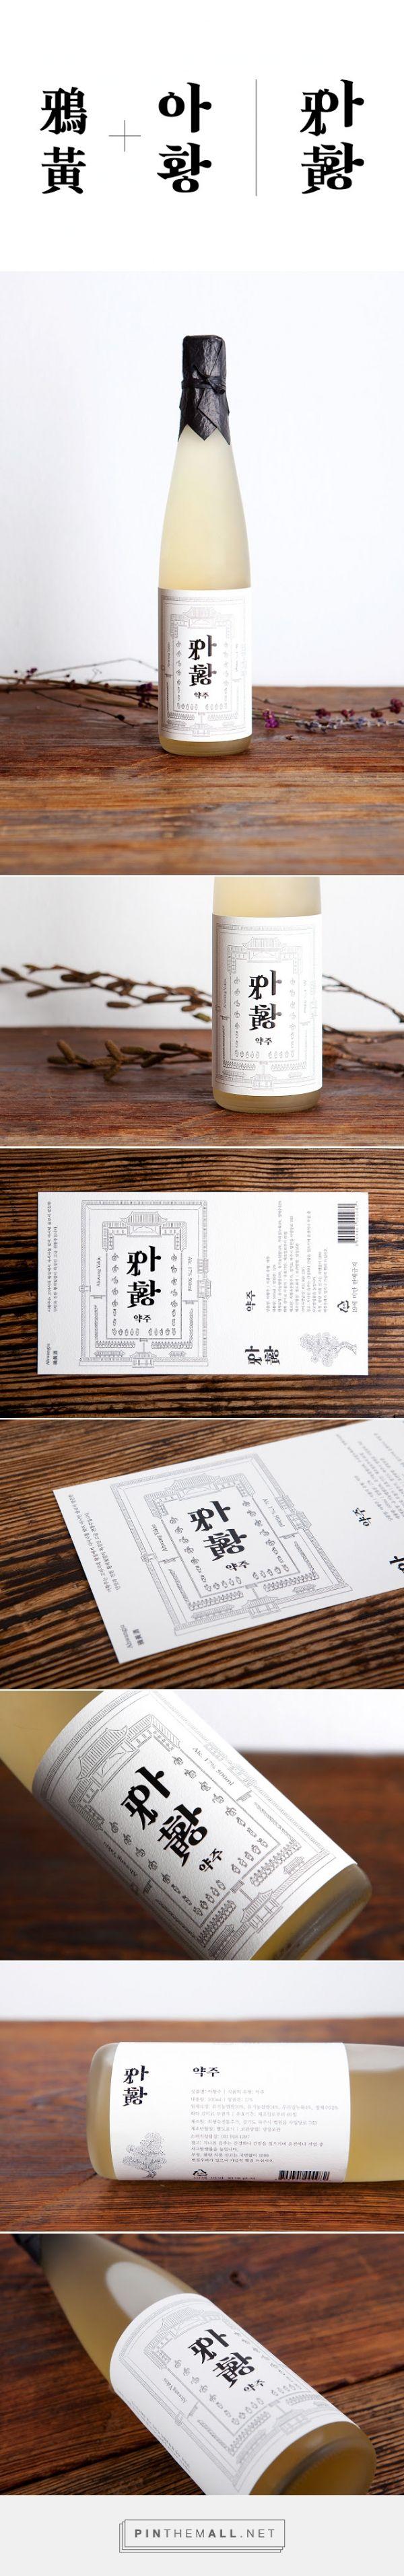 Ahwang-ju rice #wine #packaging by ContentFormContext - http://www.packagingoftheworld.com/2015/02/ahwang-ju.html